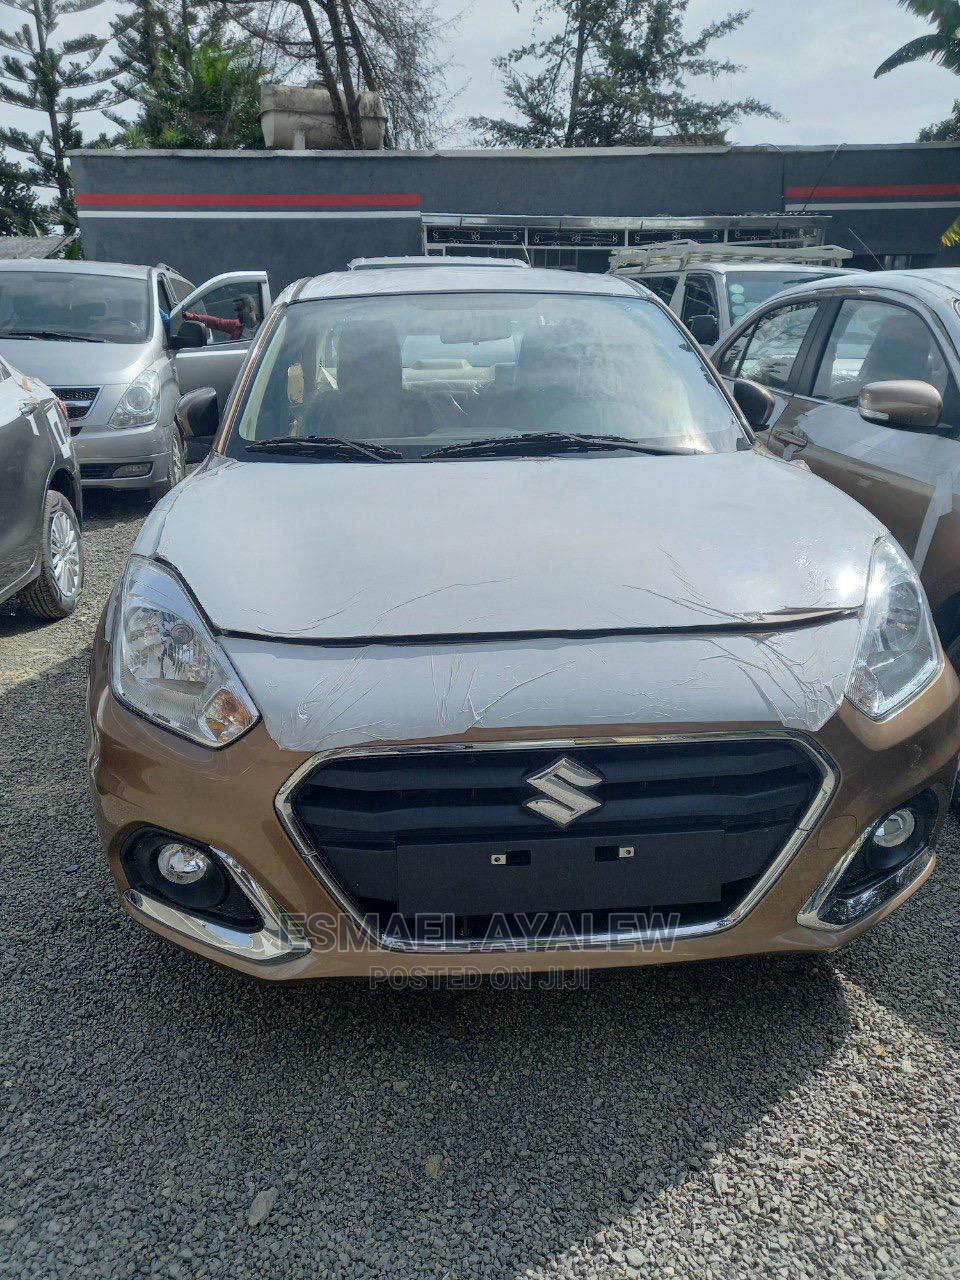 New Suzuki Dzire 2021   Cars for sale in Lideta, Addis Ababa, Ethiopia